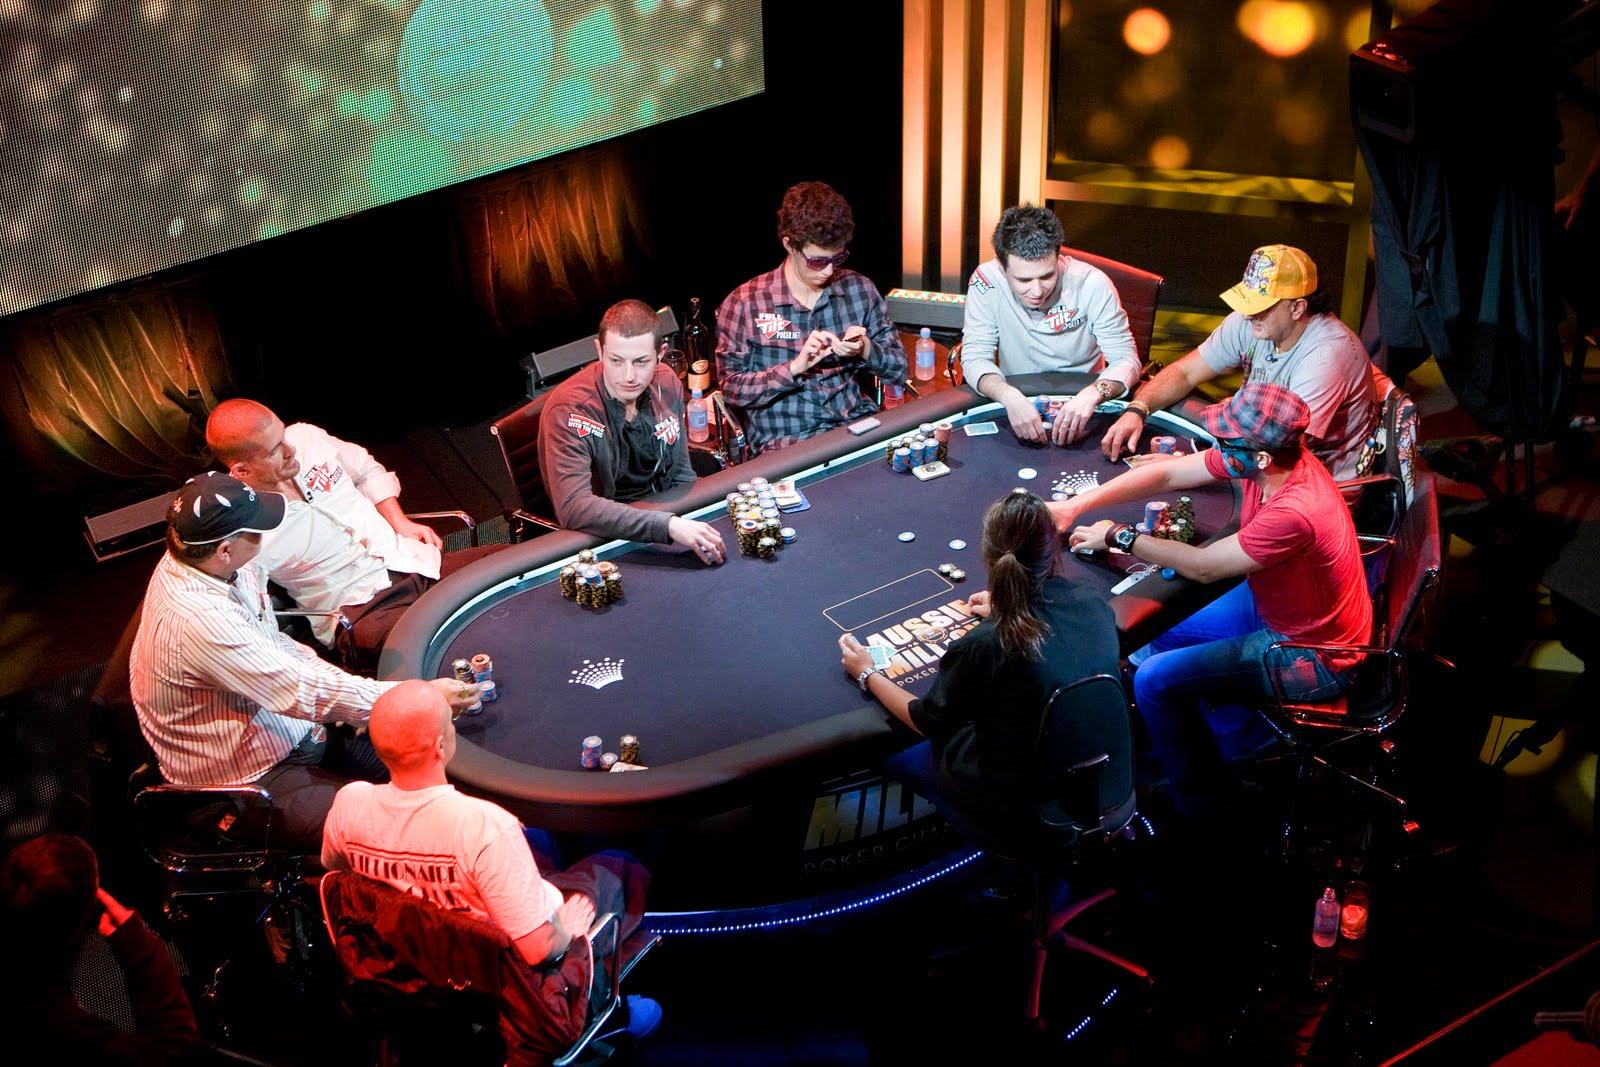 Jetset Poker